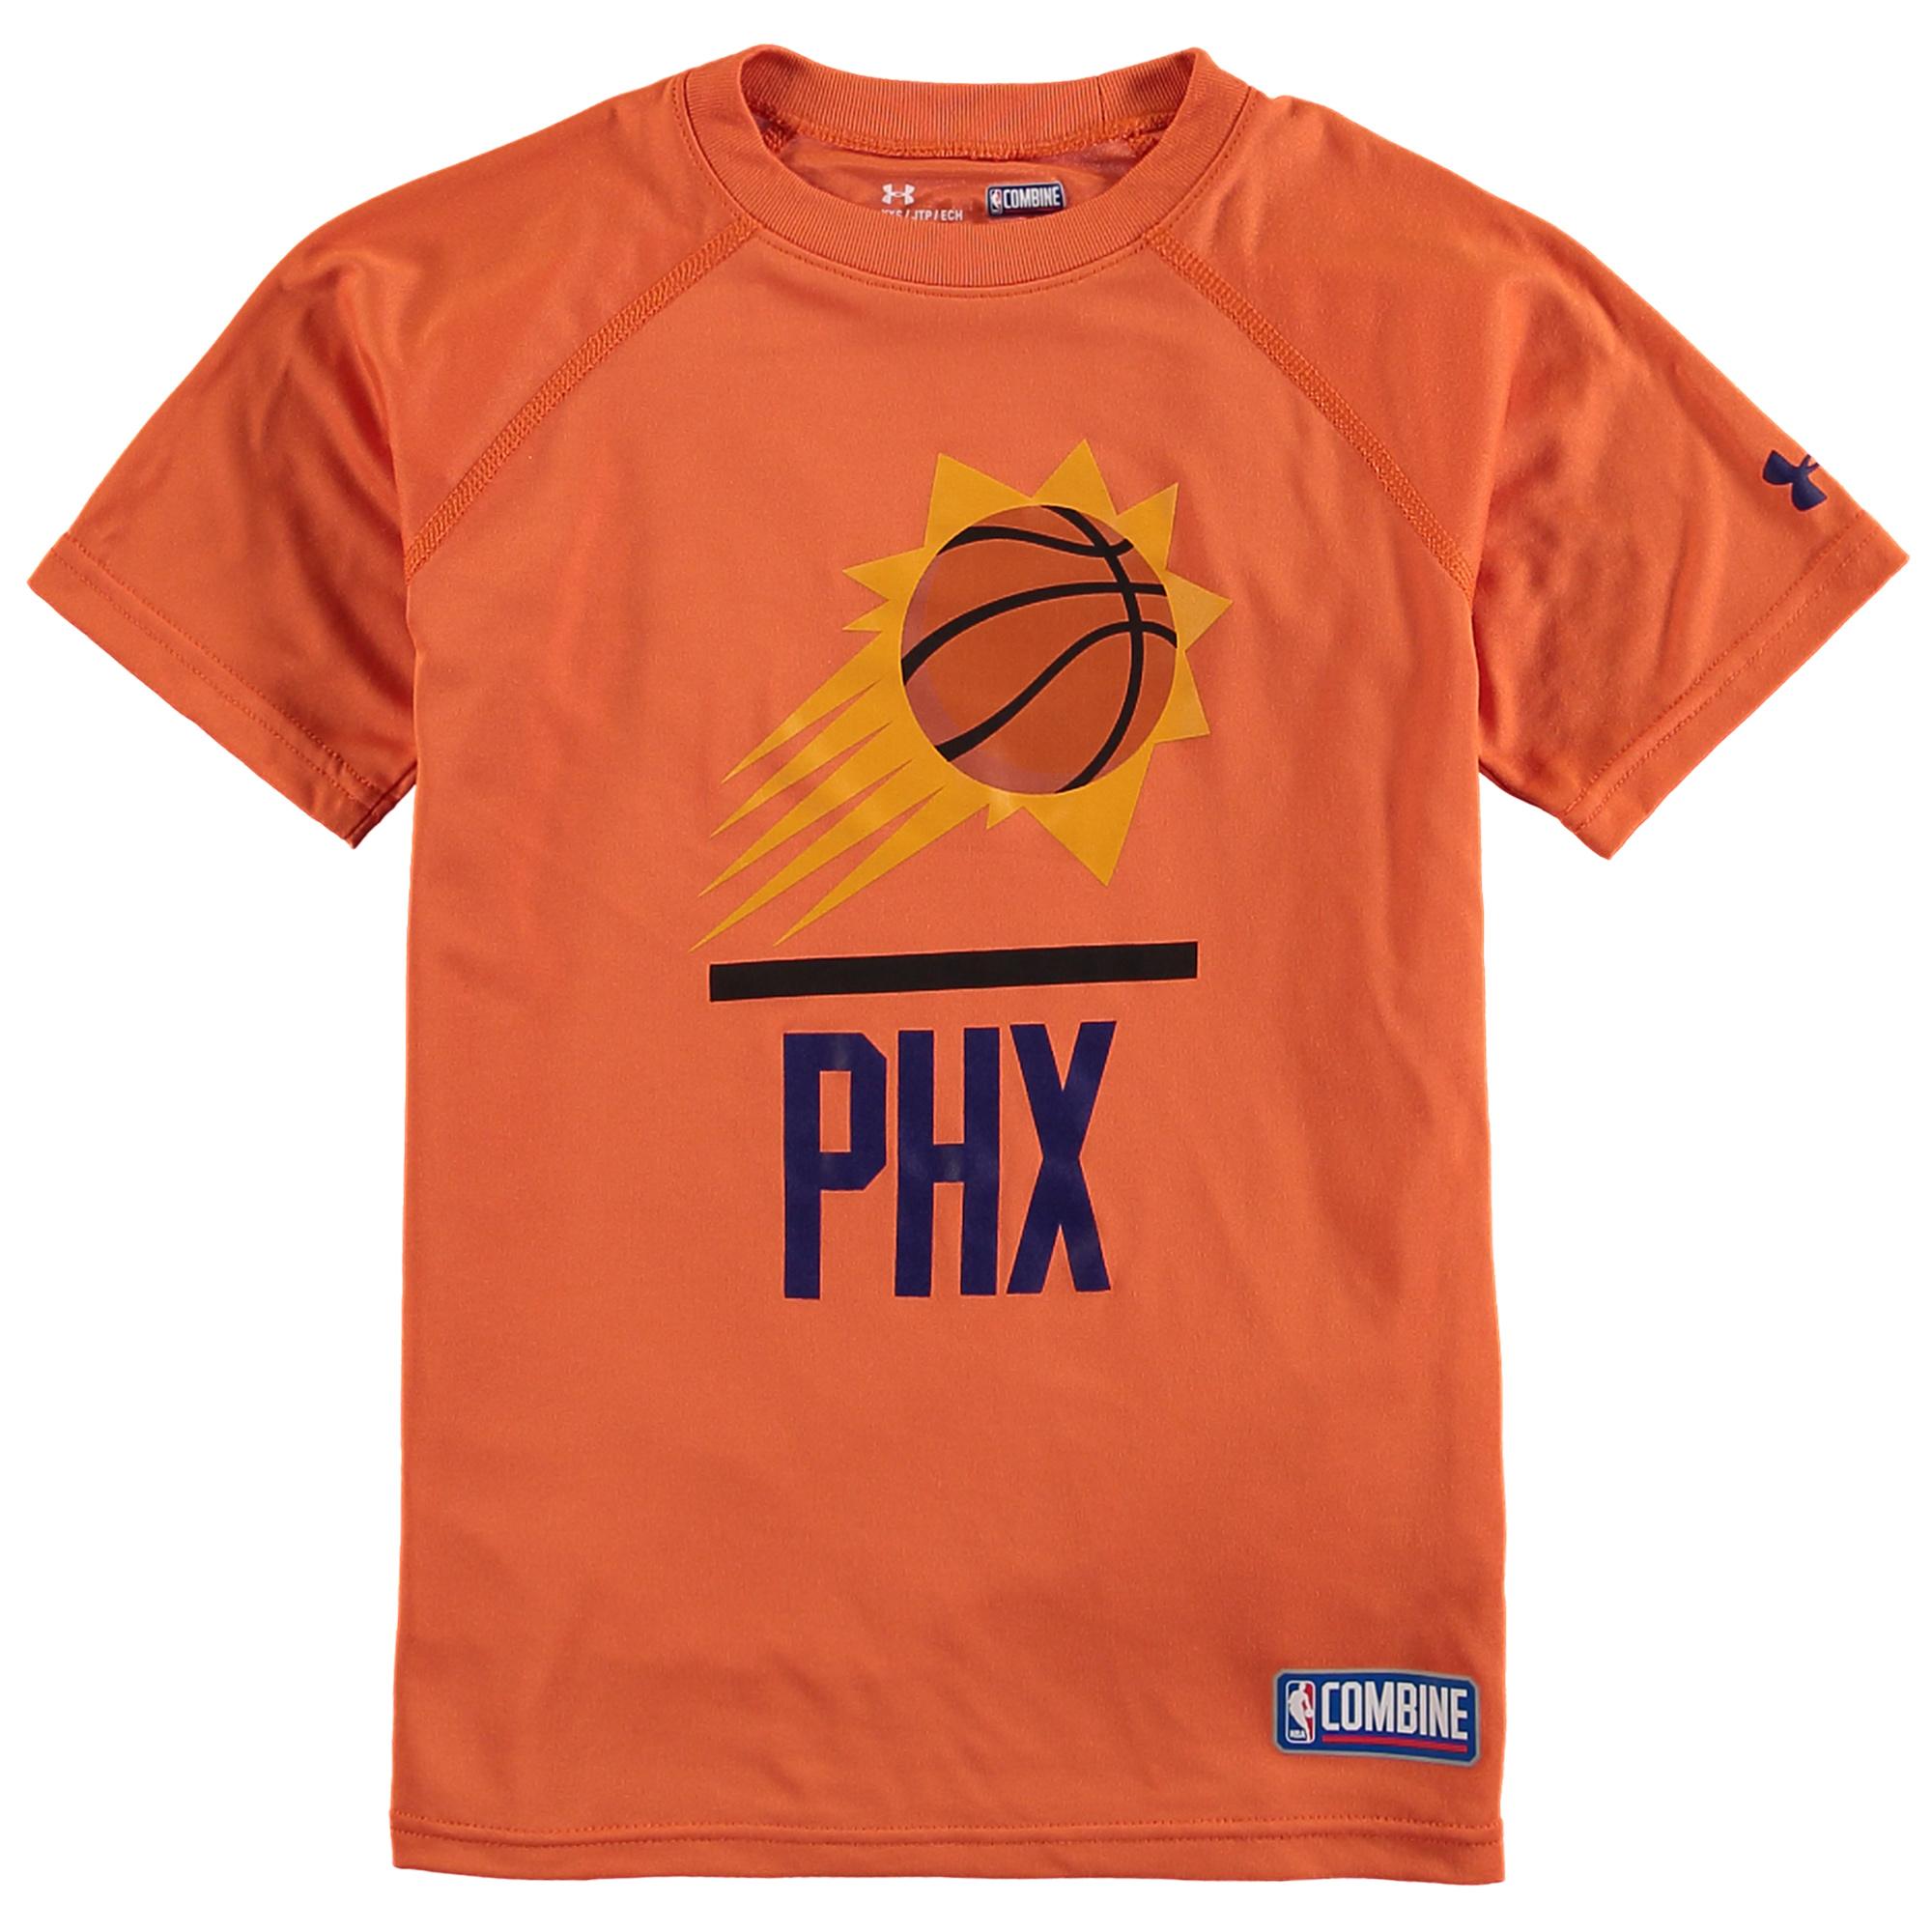 Phoenix Suns Under Armour Youth Authentic Lock Up Performance T-Shirt - Orange